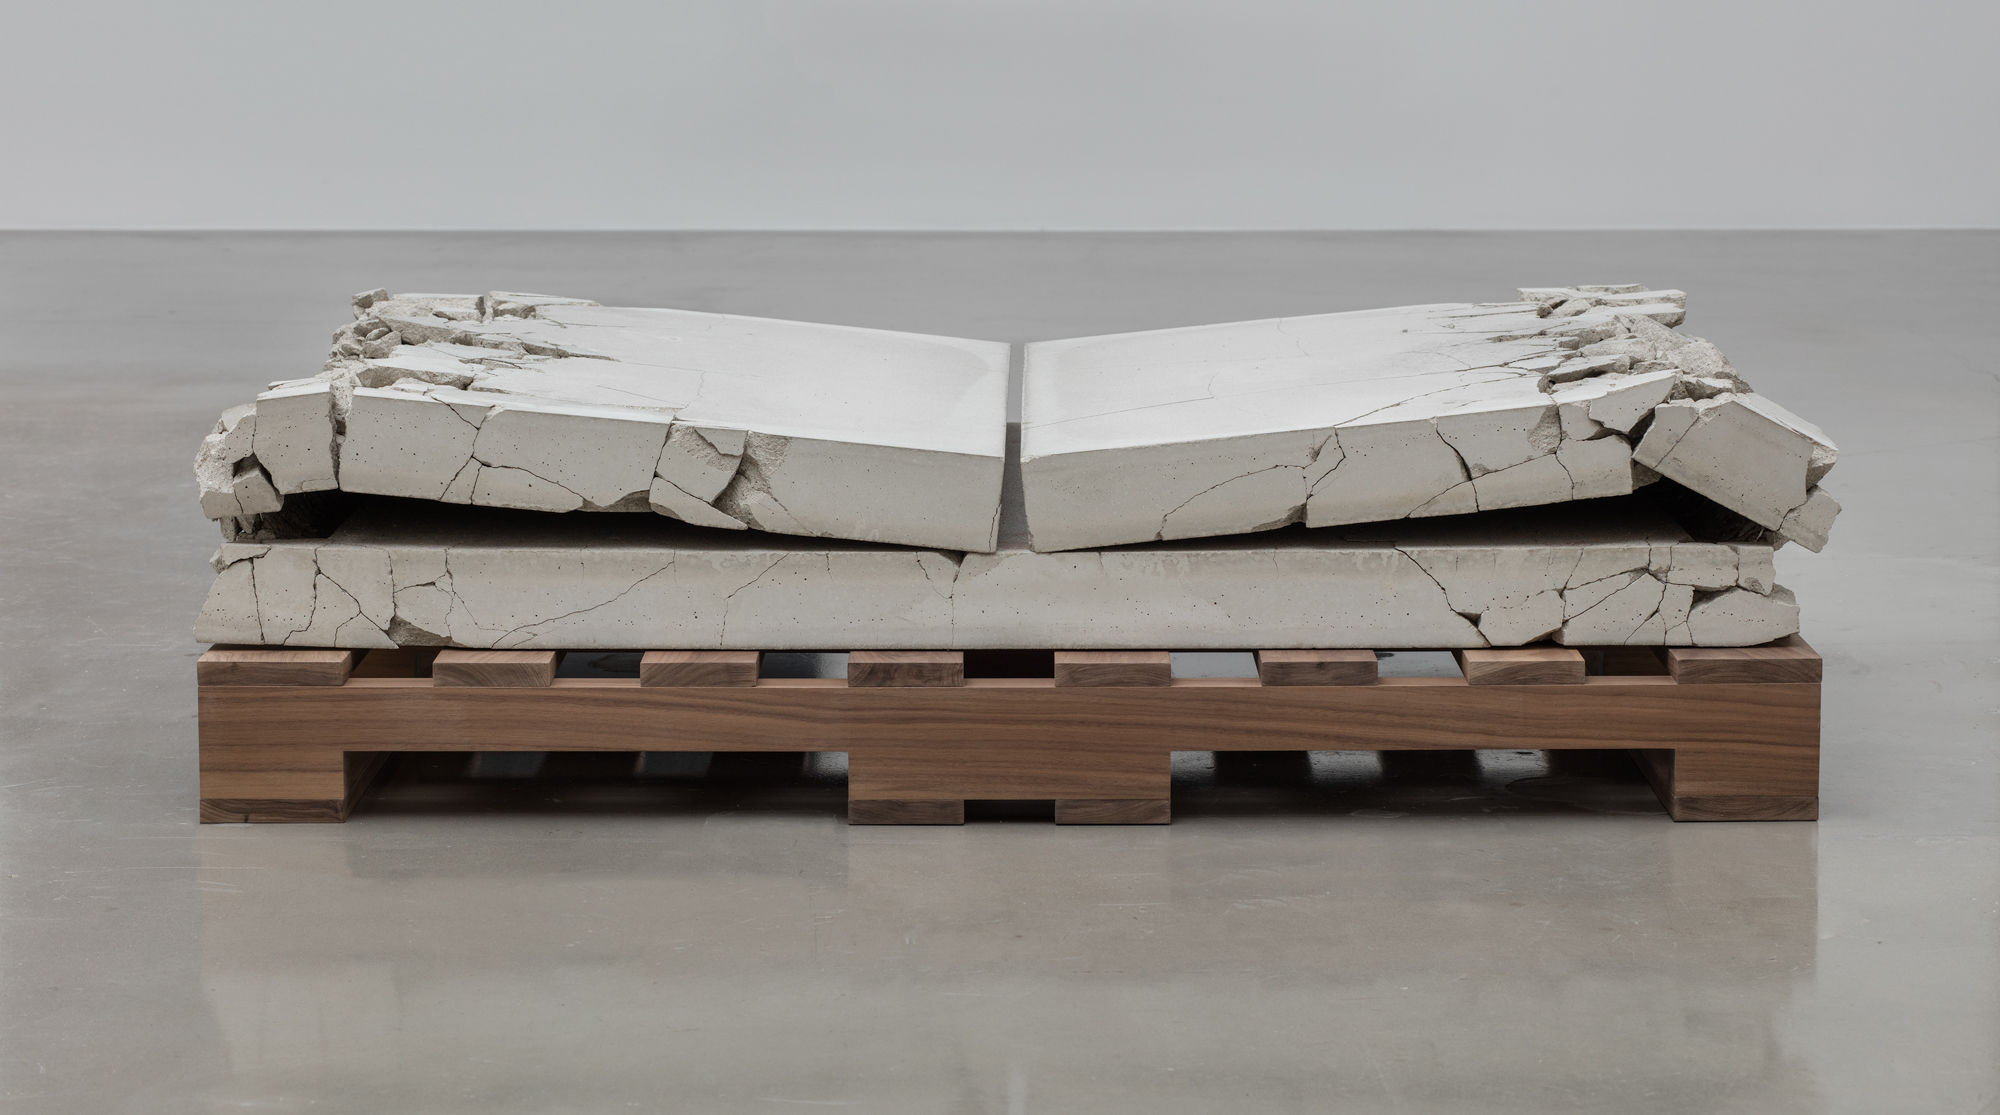 Analia Saban, Folded Concrete (Gate Fold), 2017.  Concrete on walnut pallet.  33 x 127 x 94 cm. Photo by Brian Forrest.